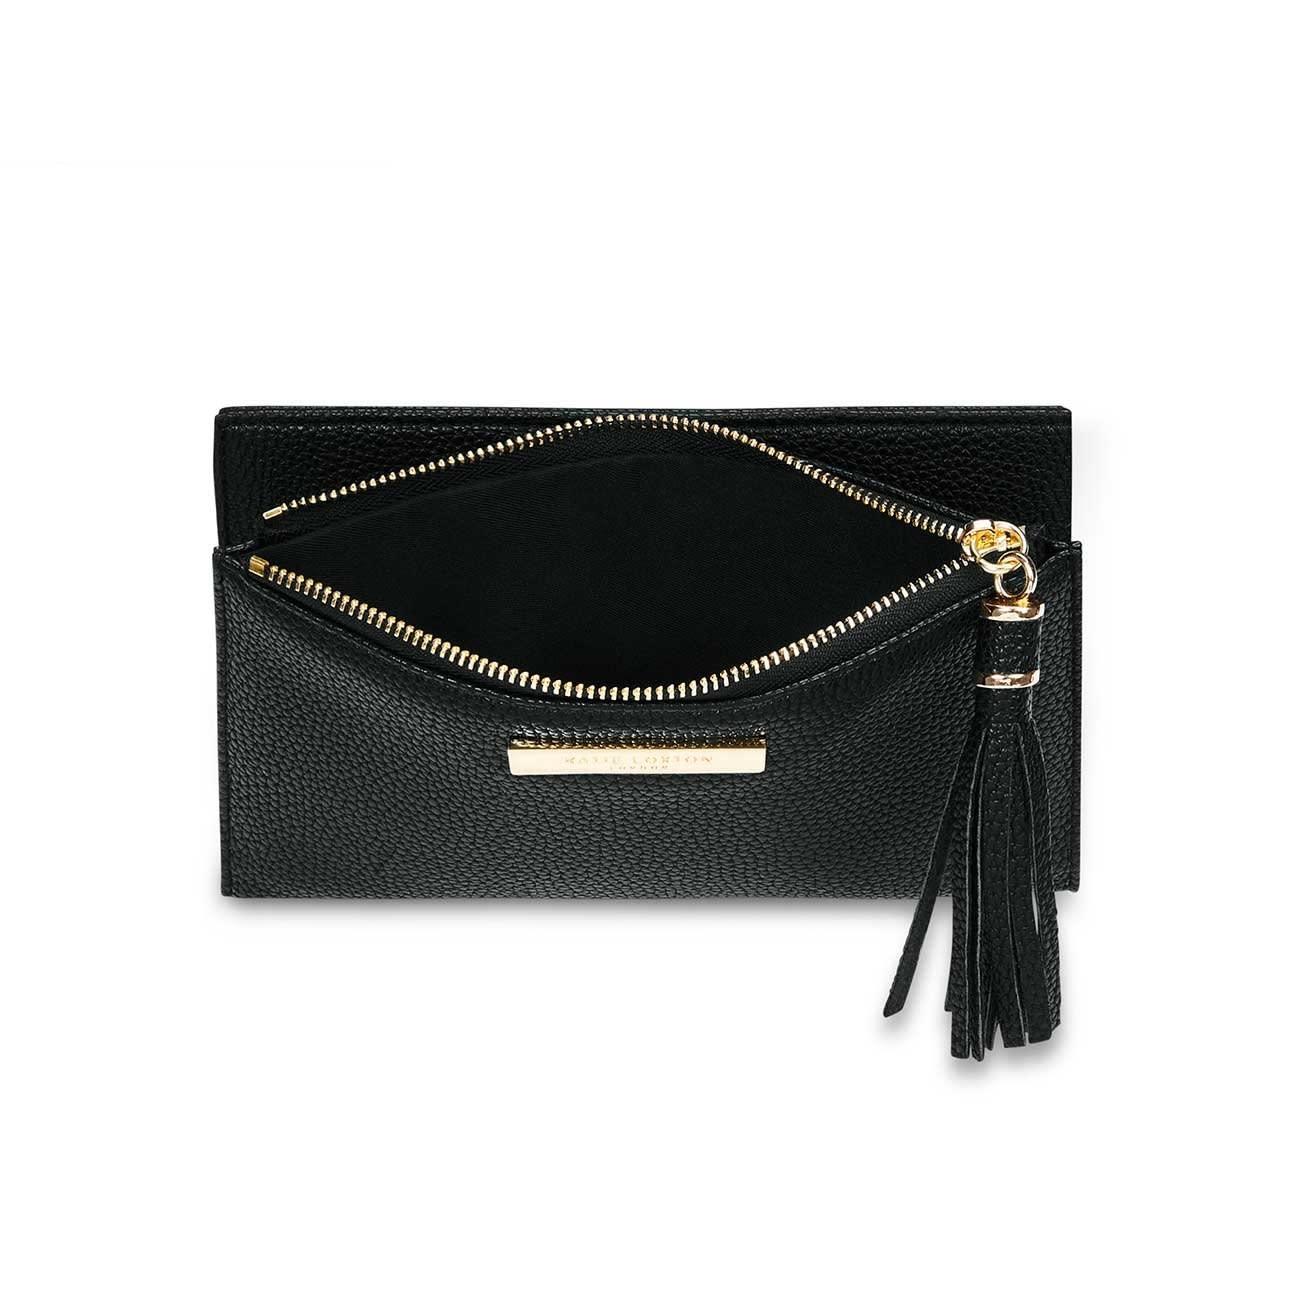 Katie Loxton Sophia tassel fold out purse black - 11 x 19 cm